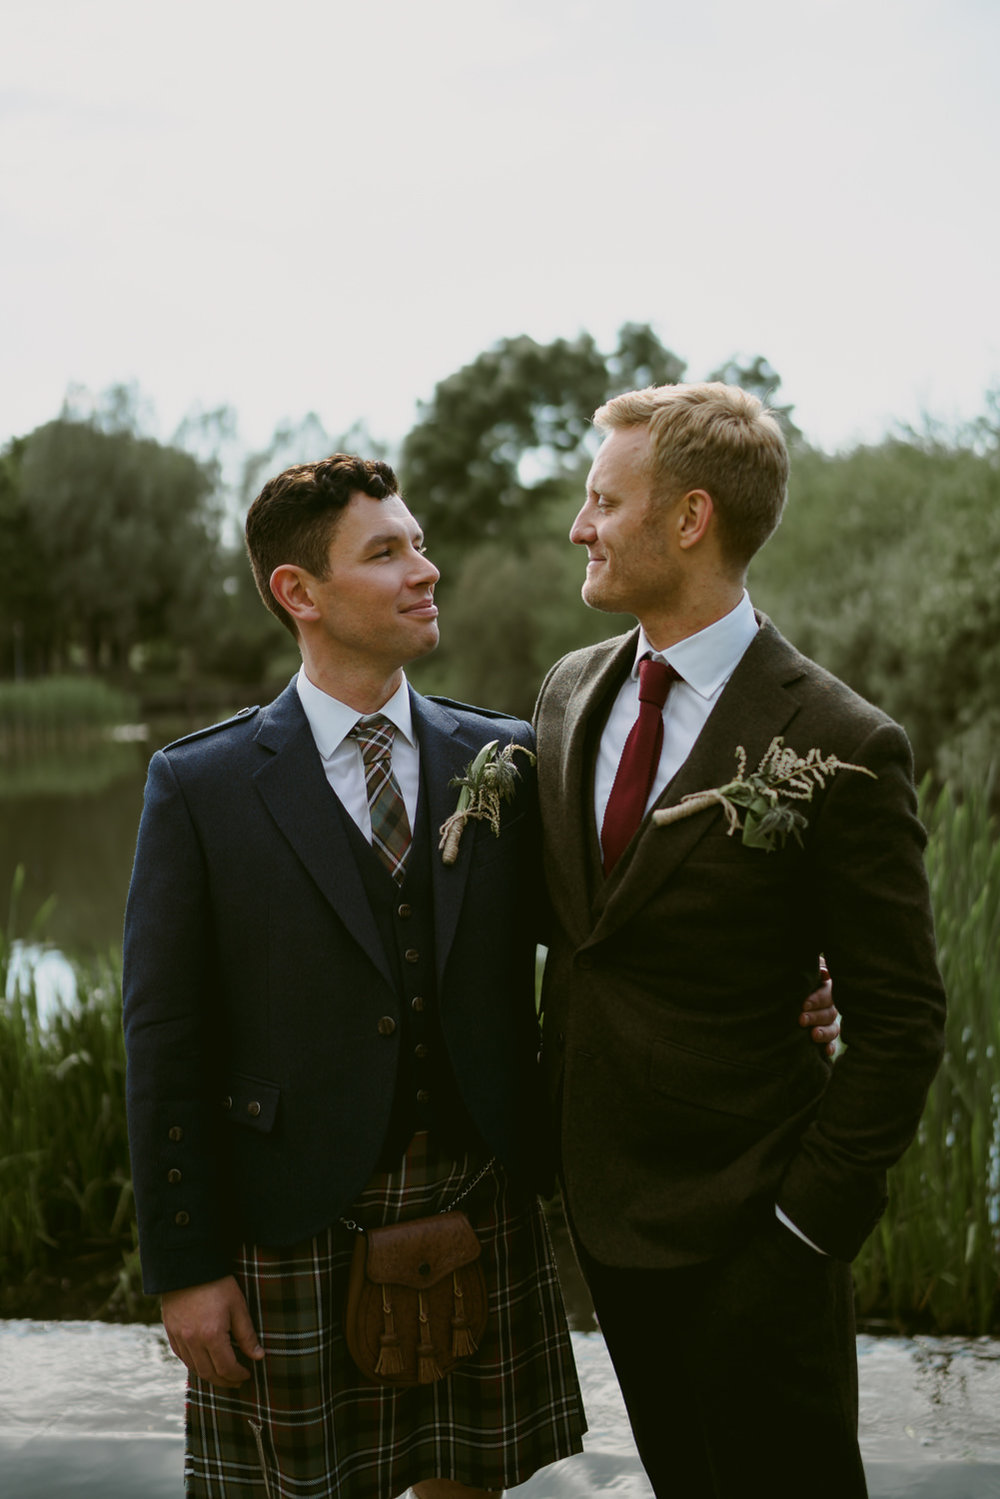 amsterdam-wedding-photographer-trouwfotograaf-bruidsfotograaf-mark-hadden-bruidsfotografie-David & Ronald-492.jpg